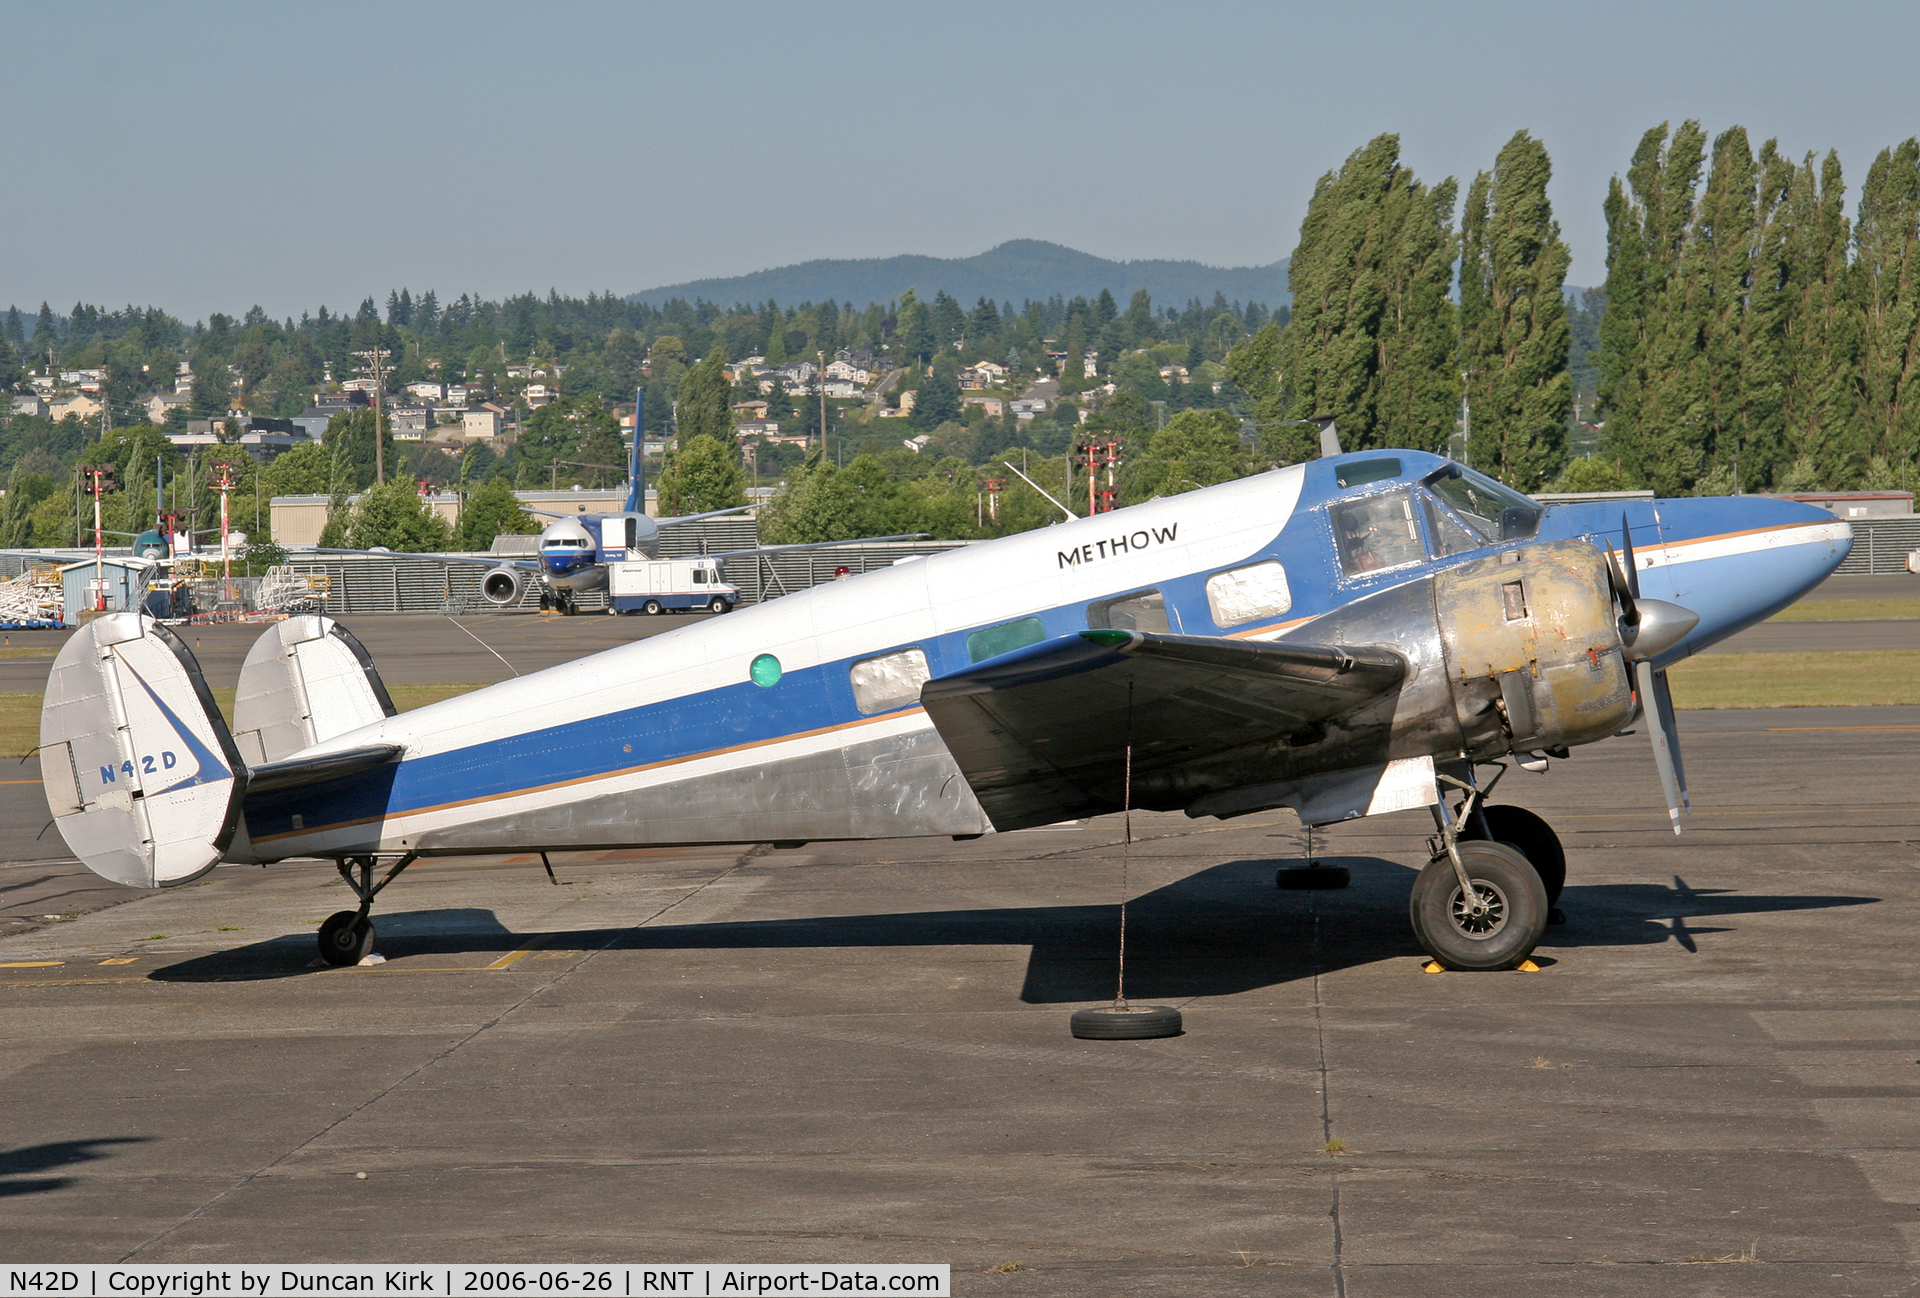 N42D, 1955 Beech E18S C/N BA-117, Post Methow operations but still wearing titles